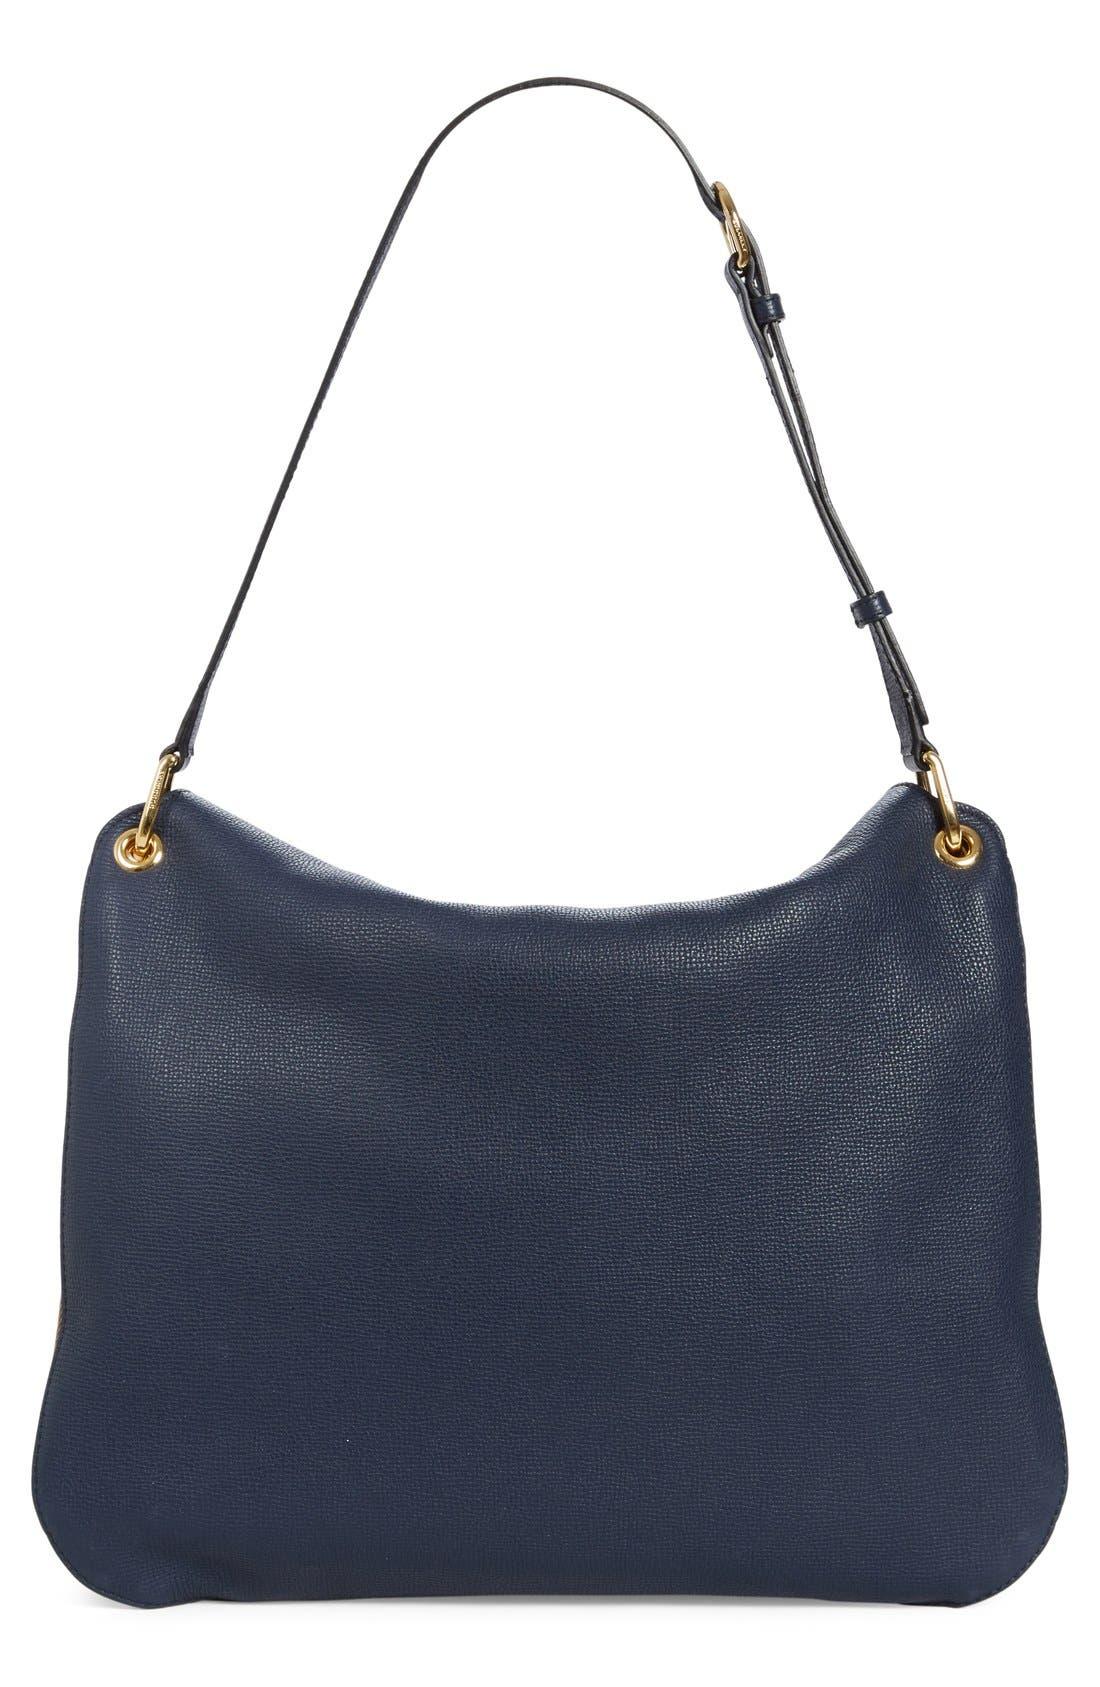 Alternate Image 3  - Burberry 'Medium Cornwall' Shoulder Bag